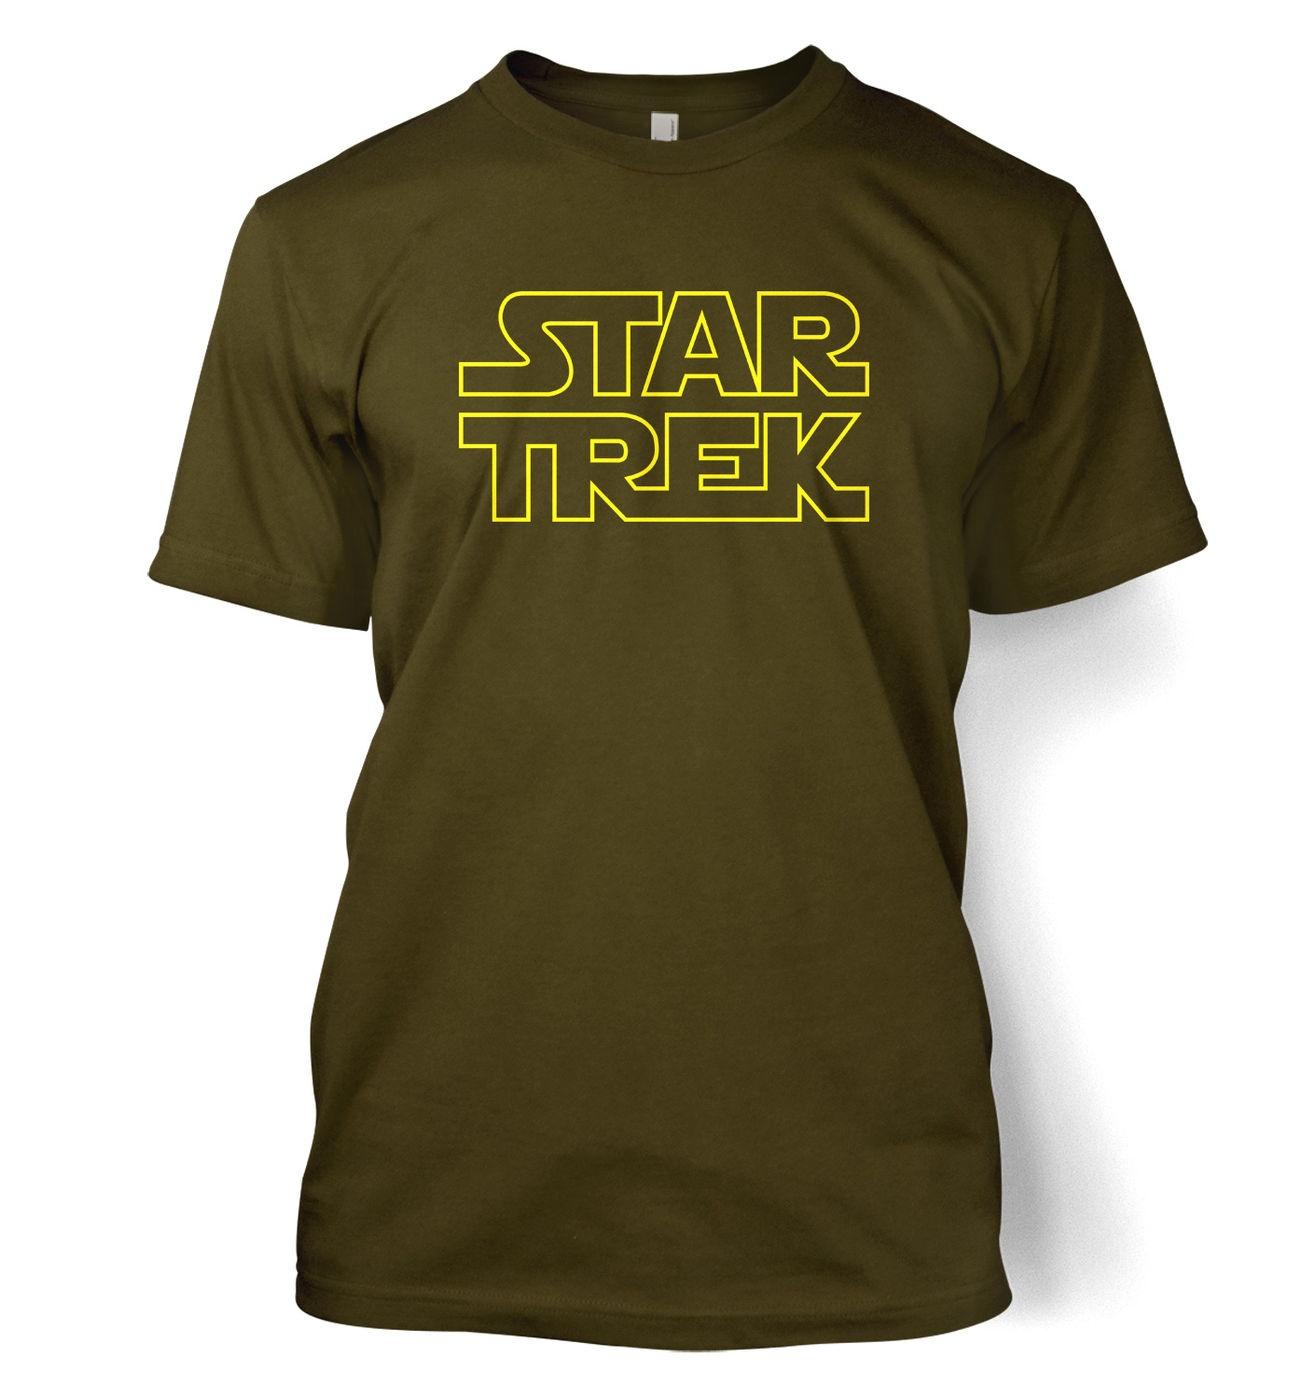 Jedi Trek t-shirt -  Star Wars & Star Trek inspired